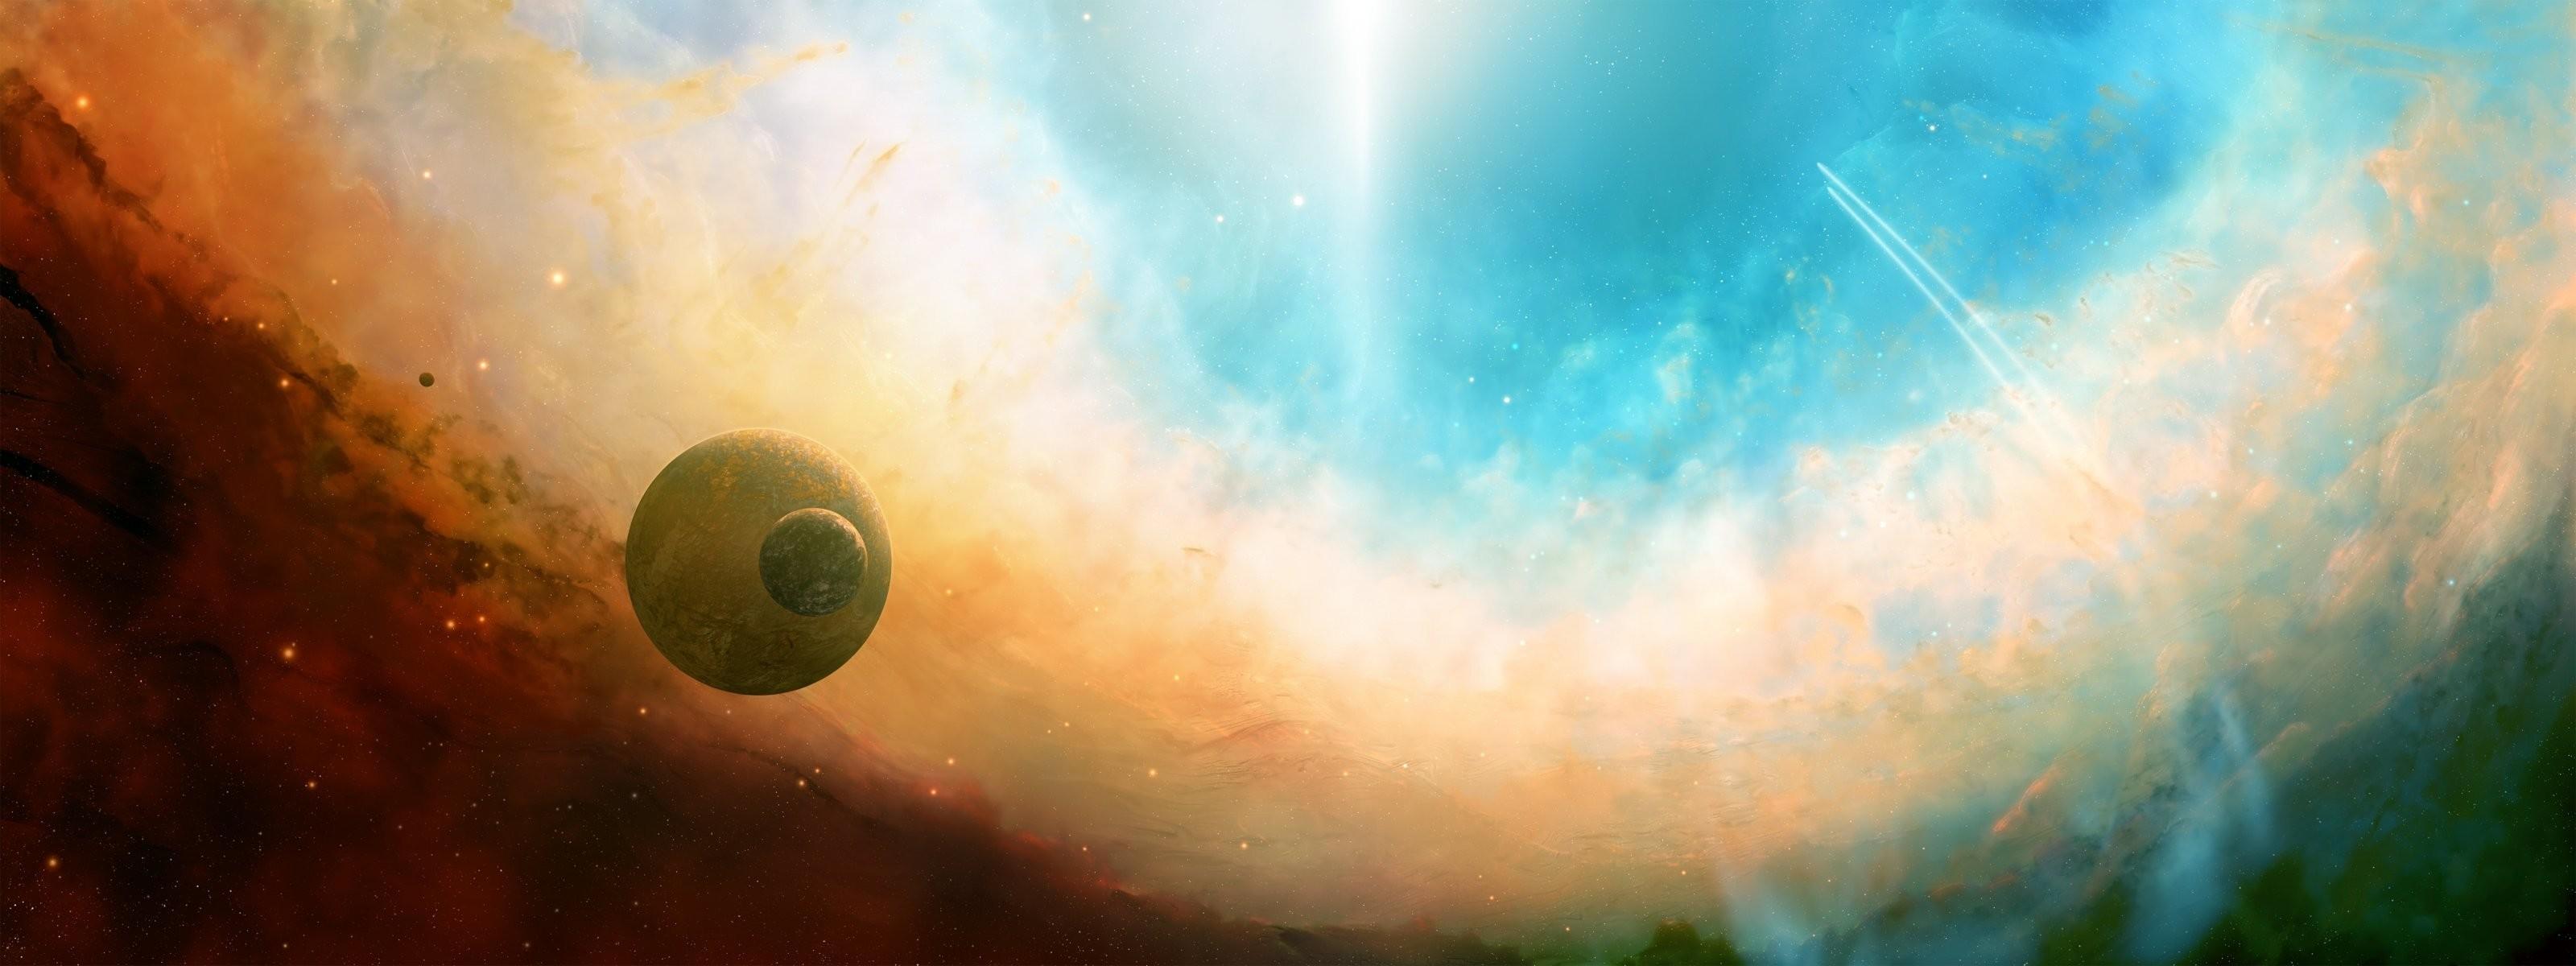 space space world lights star light flight trajectory nebula dual monitor